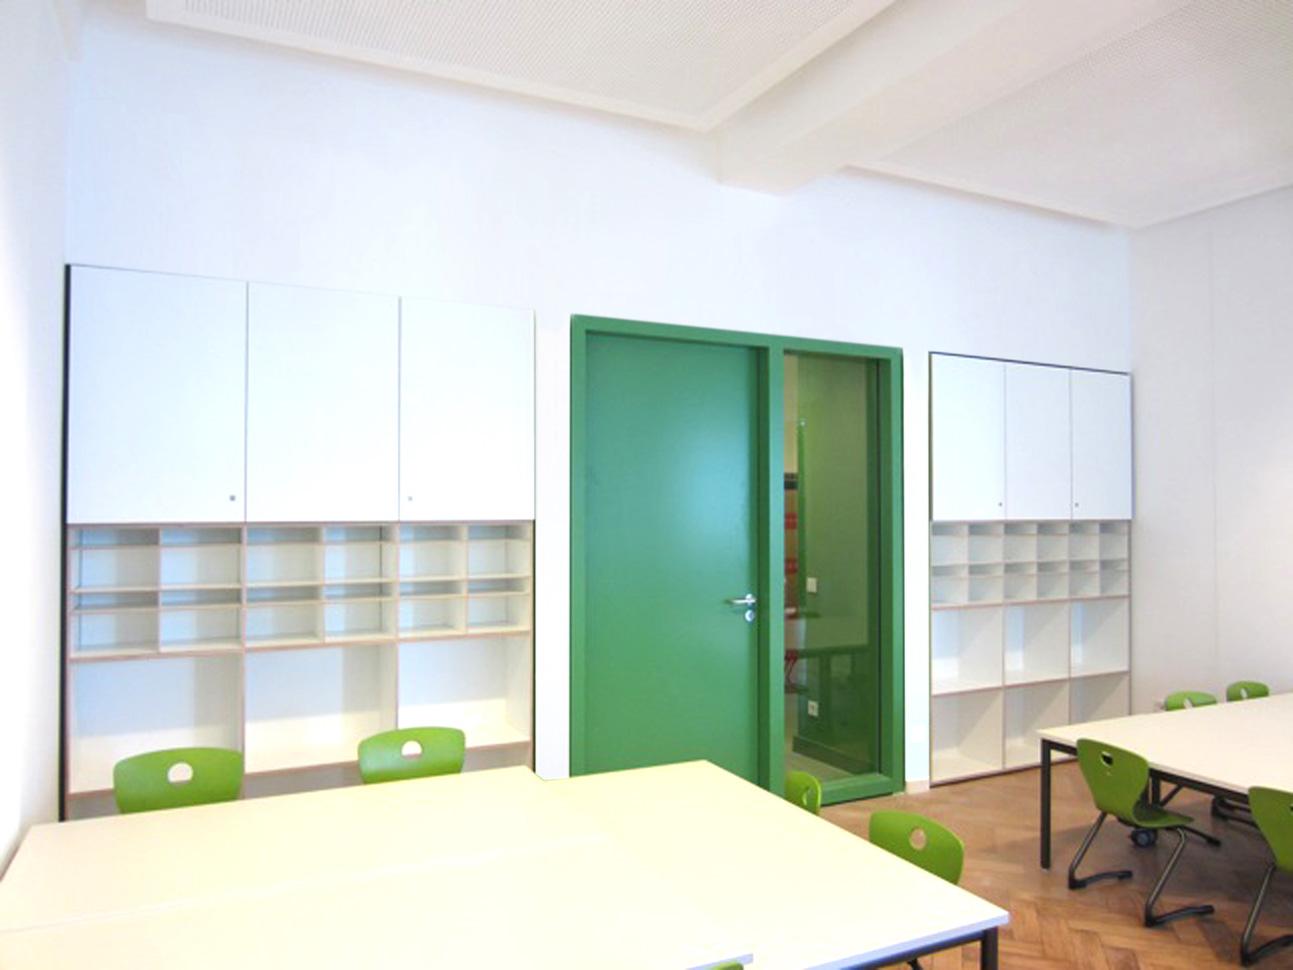 ESBF Klassenraummöblierung